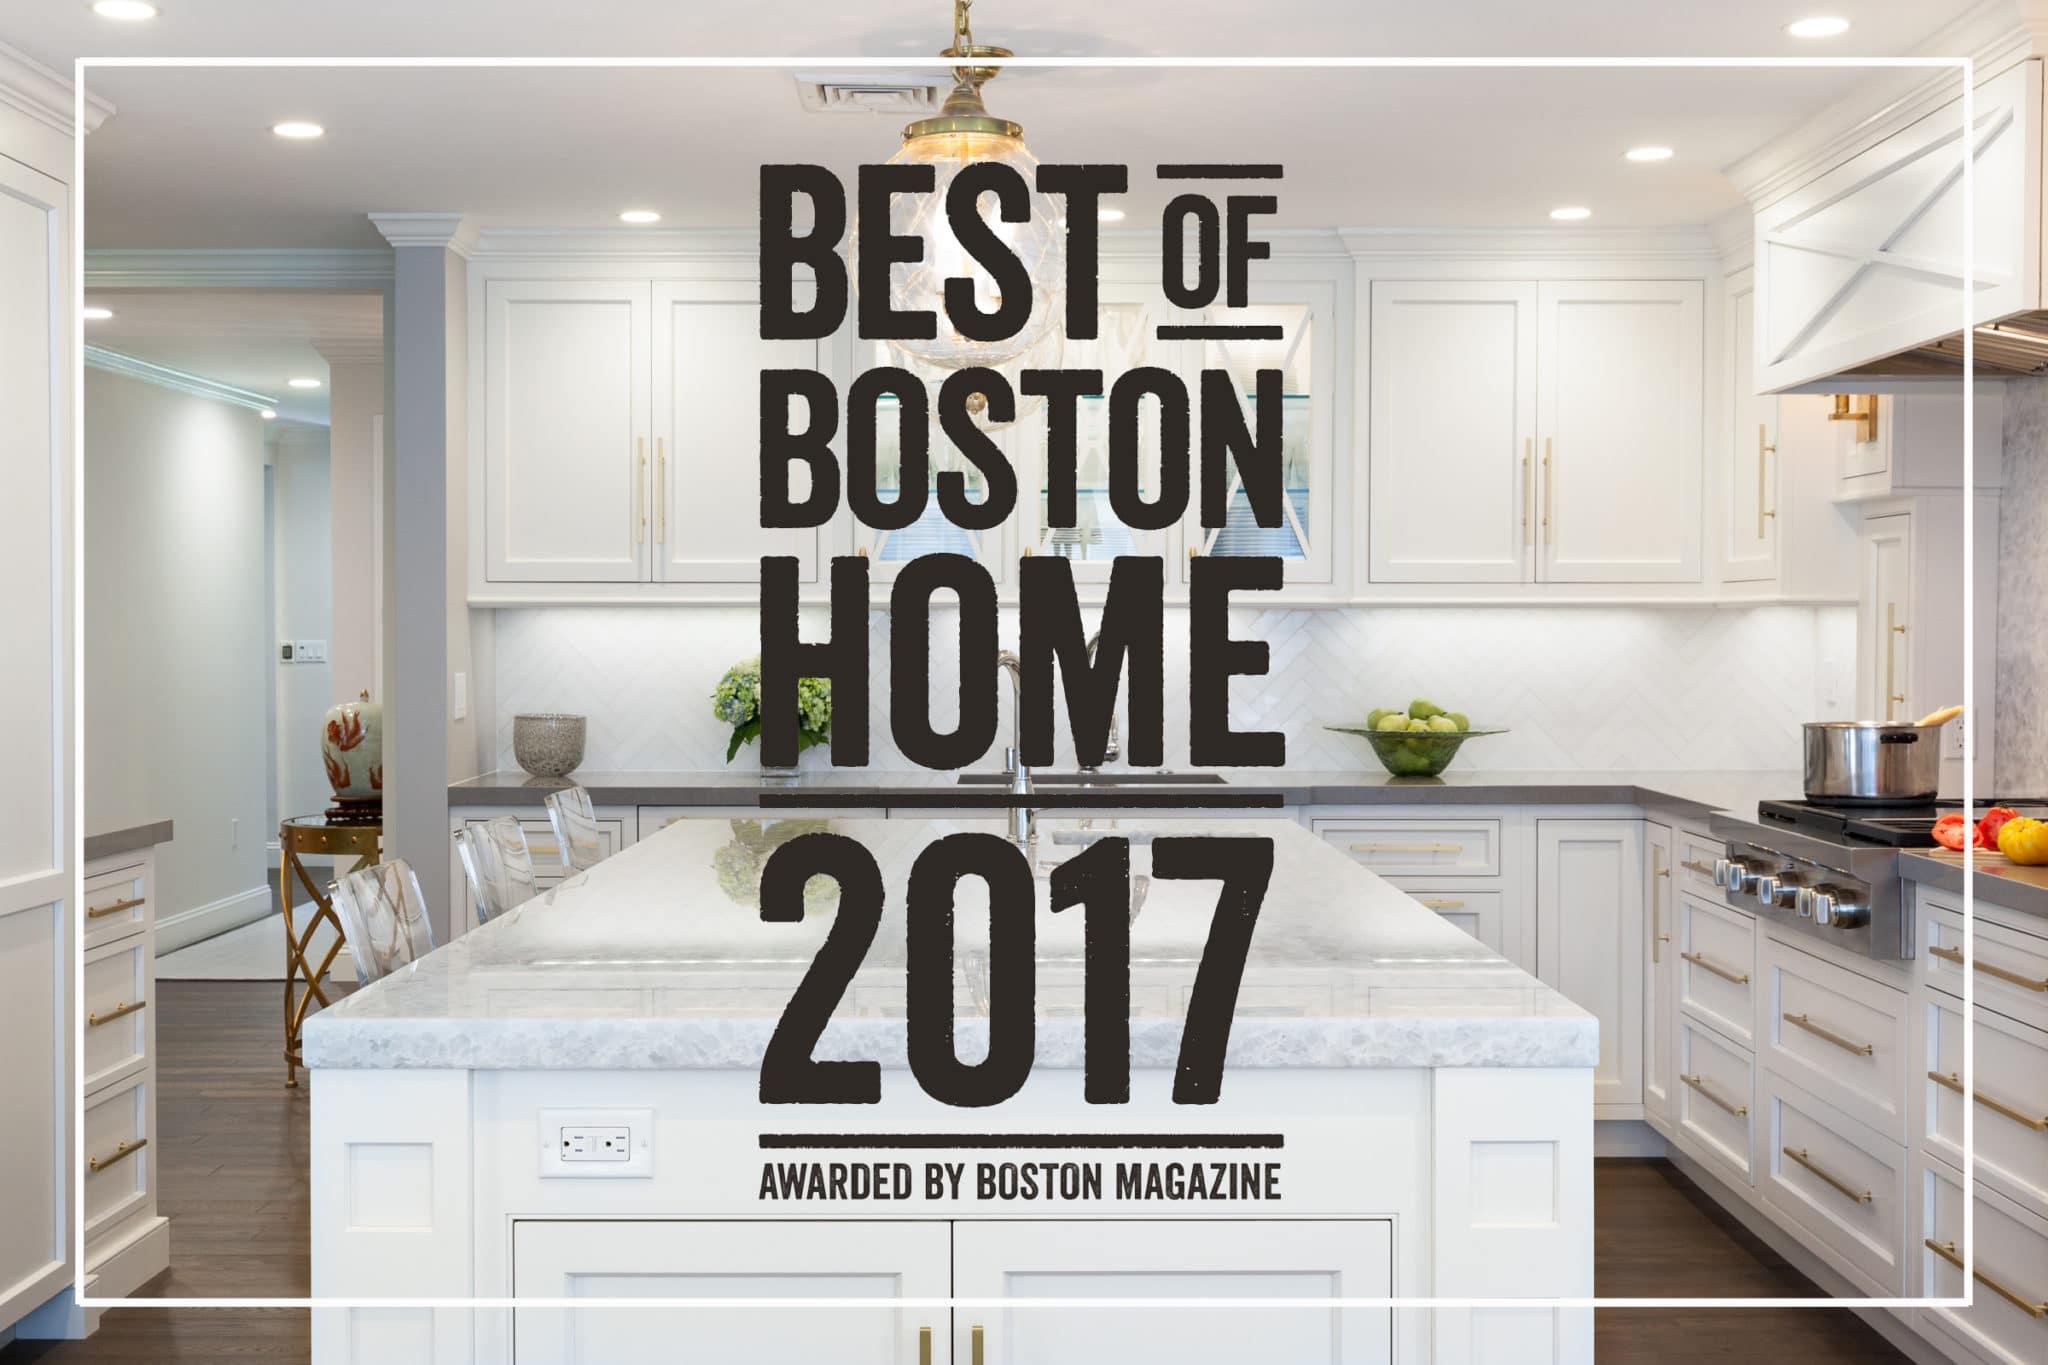 Metropolitan wins best of boston award